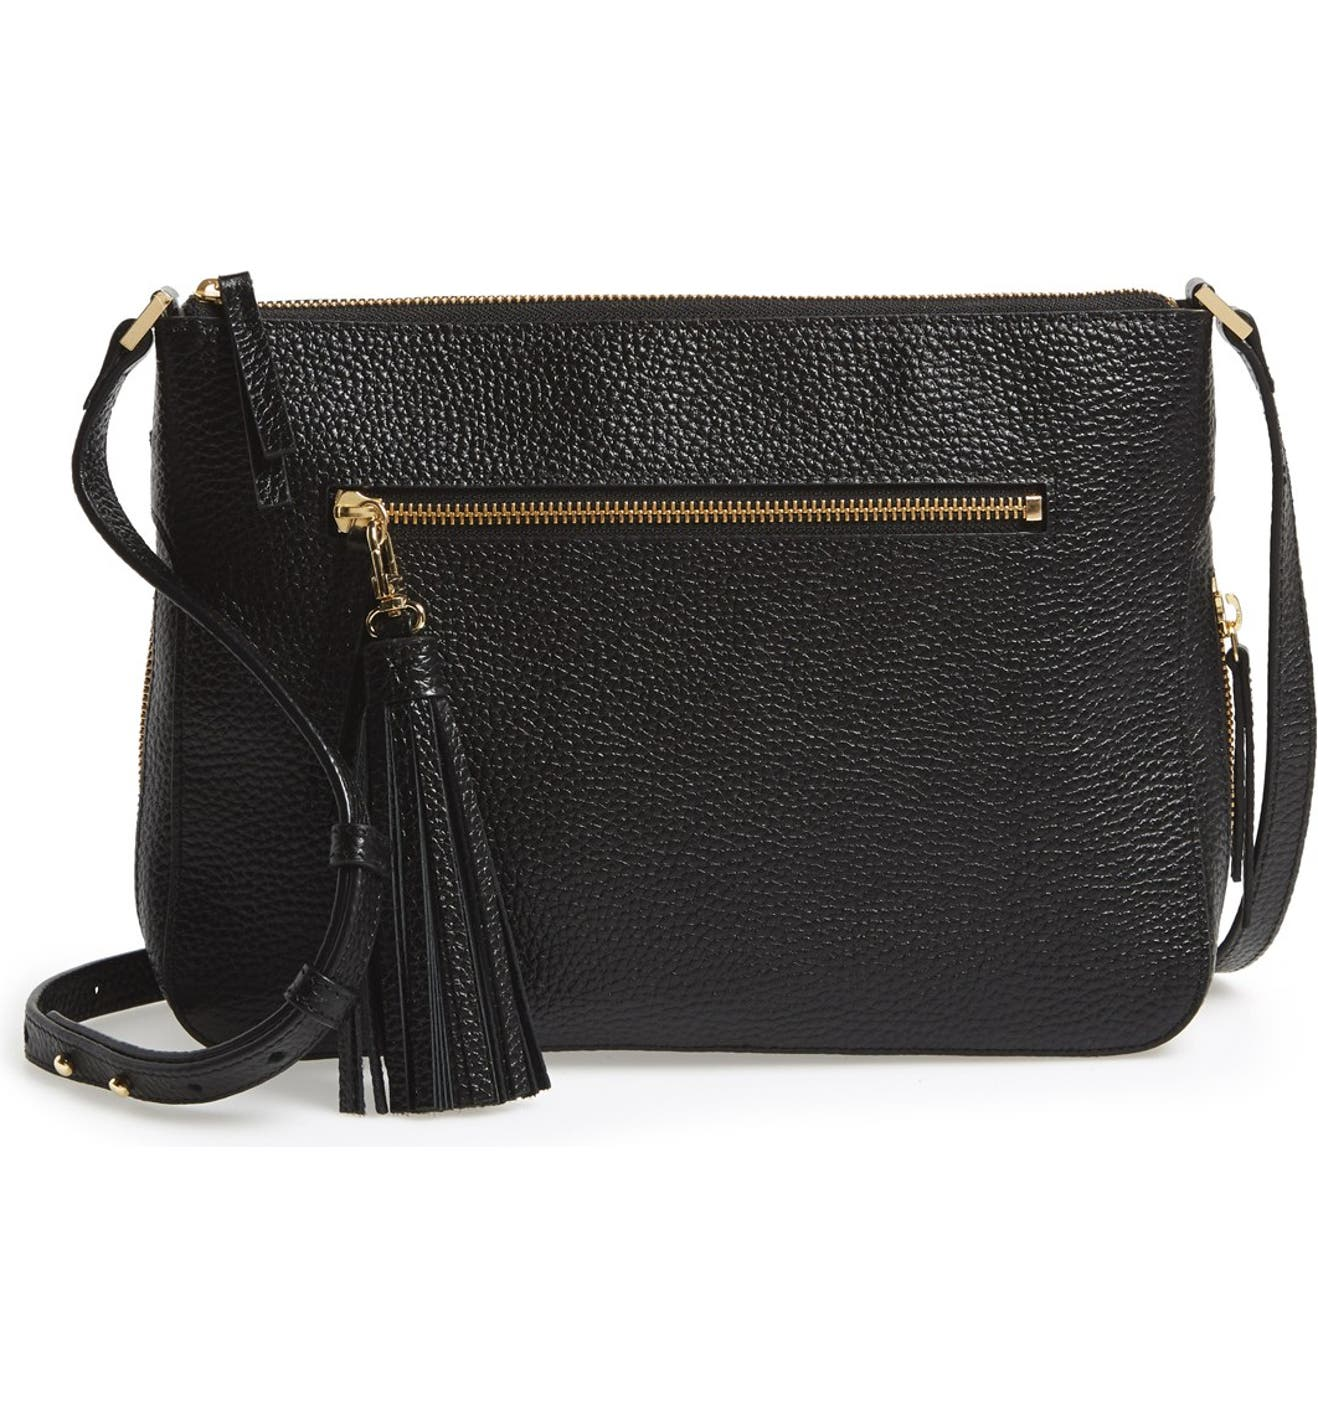 caf4fa977c2bb4 Halogen Tassel Leather Crossbody Bag | Nordstrom